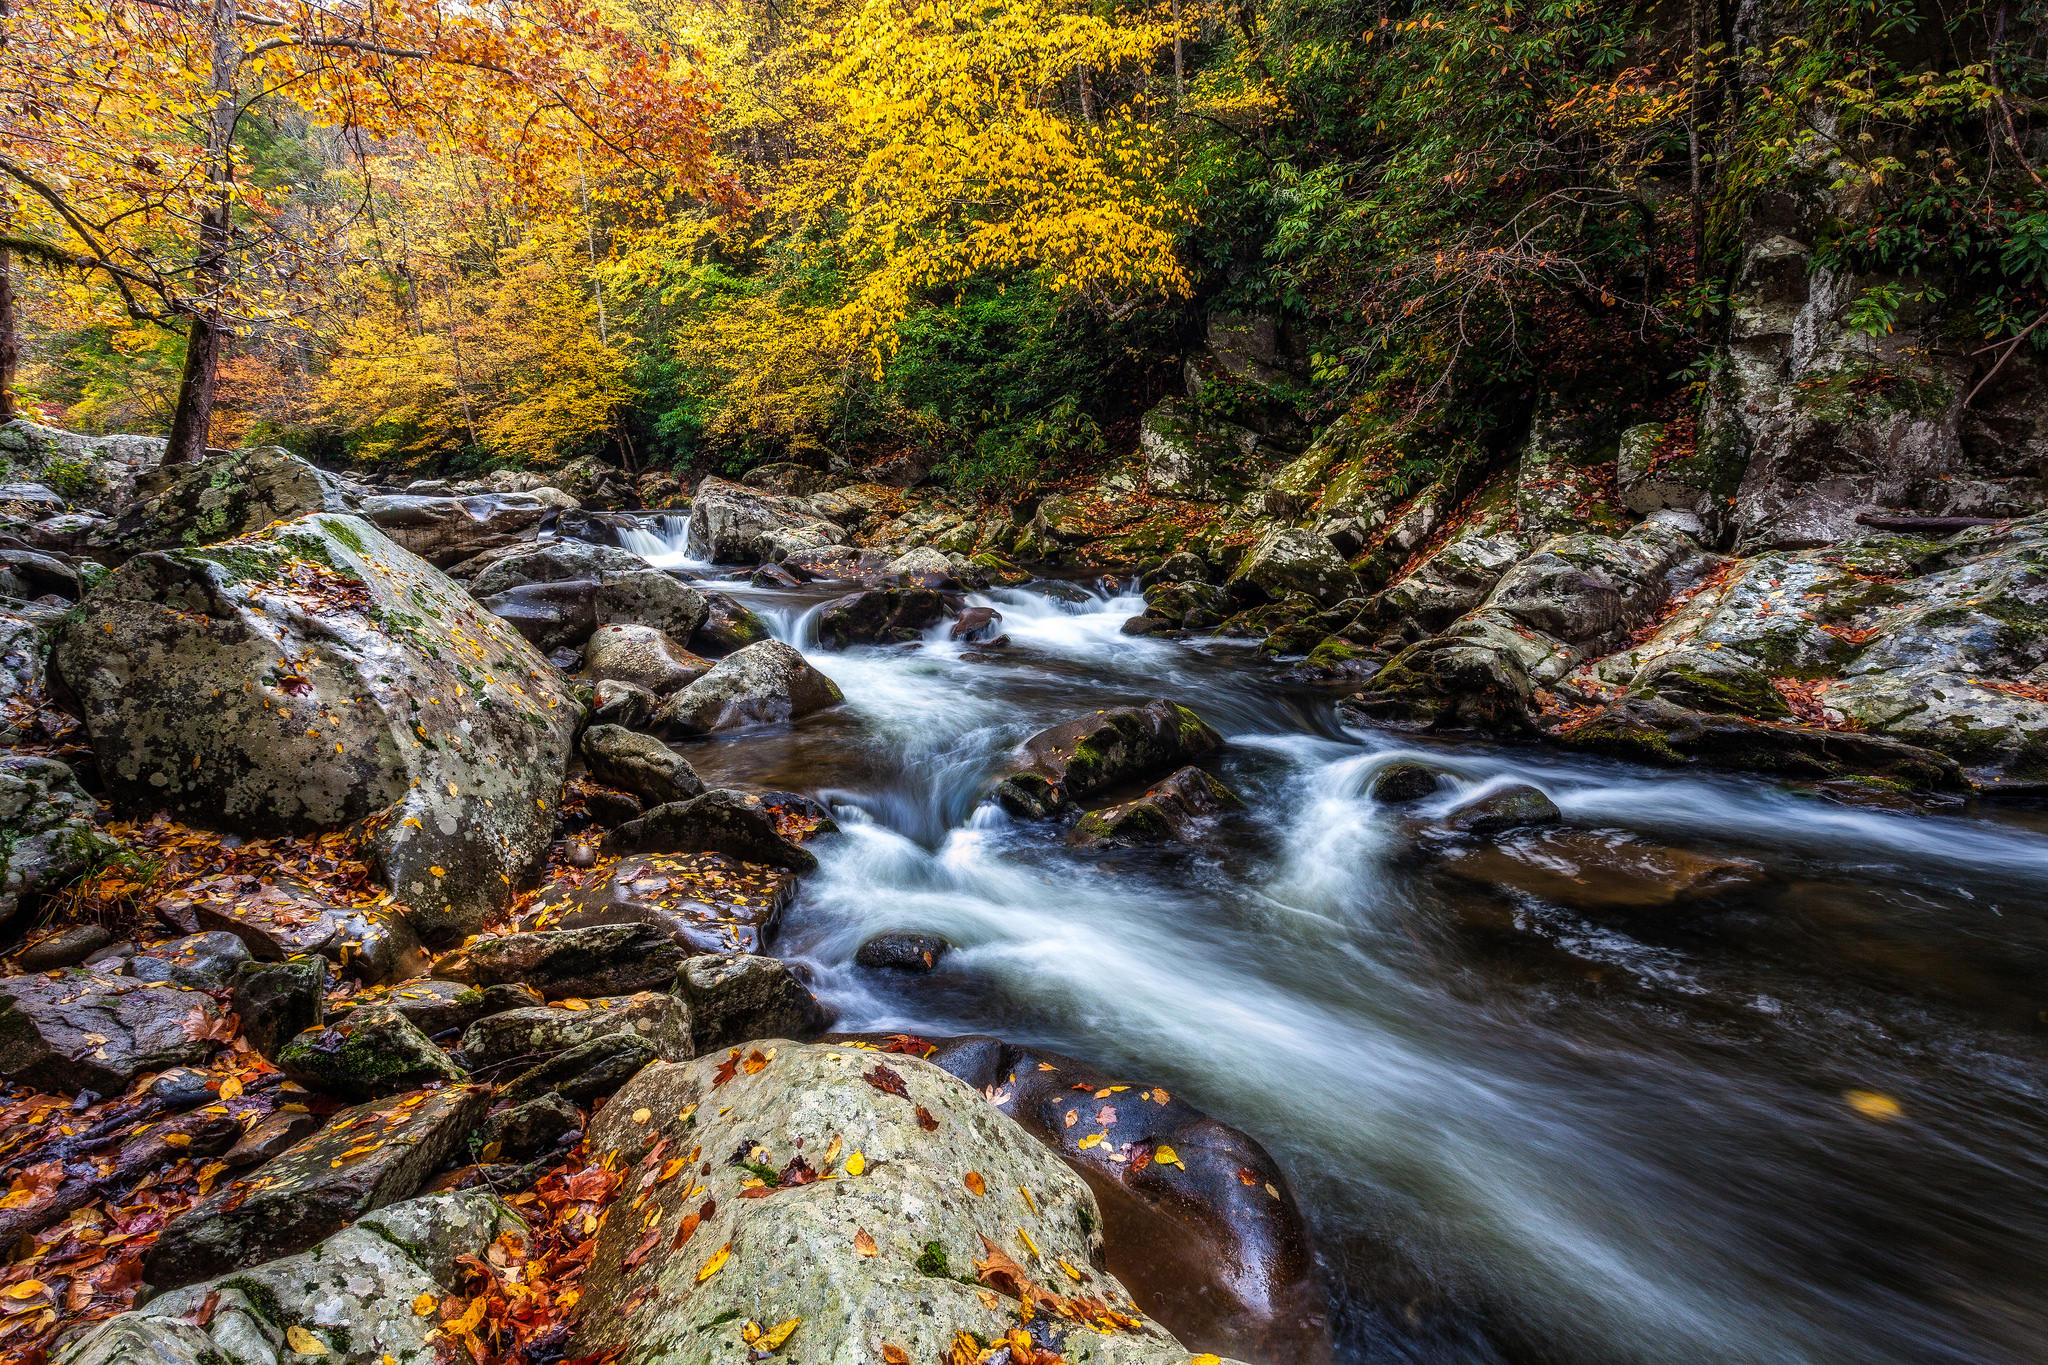 Smoky Mountains National Park, Грейт Смоки Маунтинс Парк, штат Теннесси